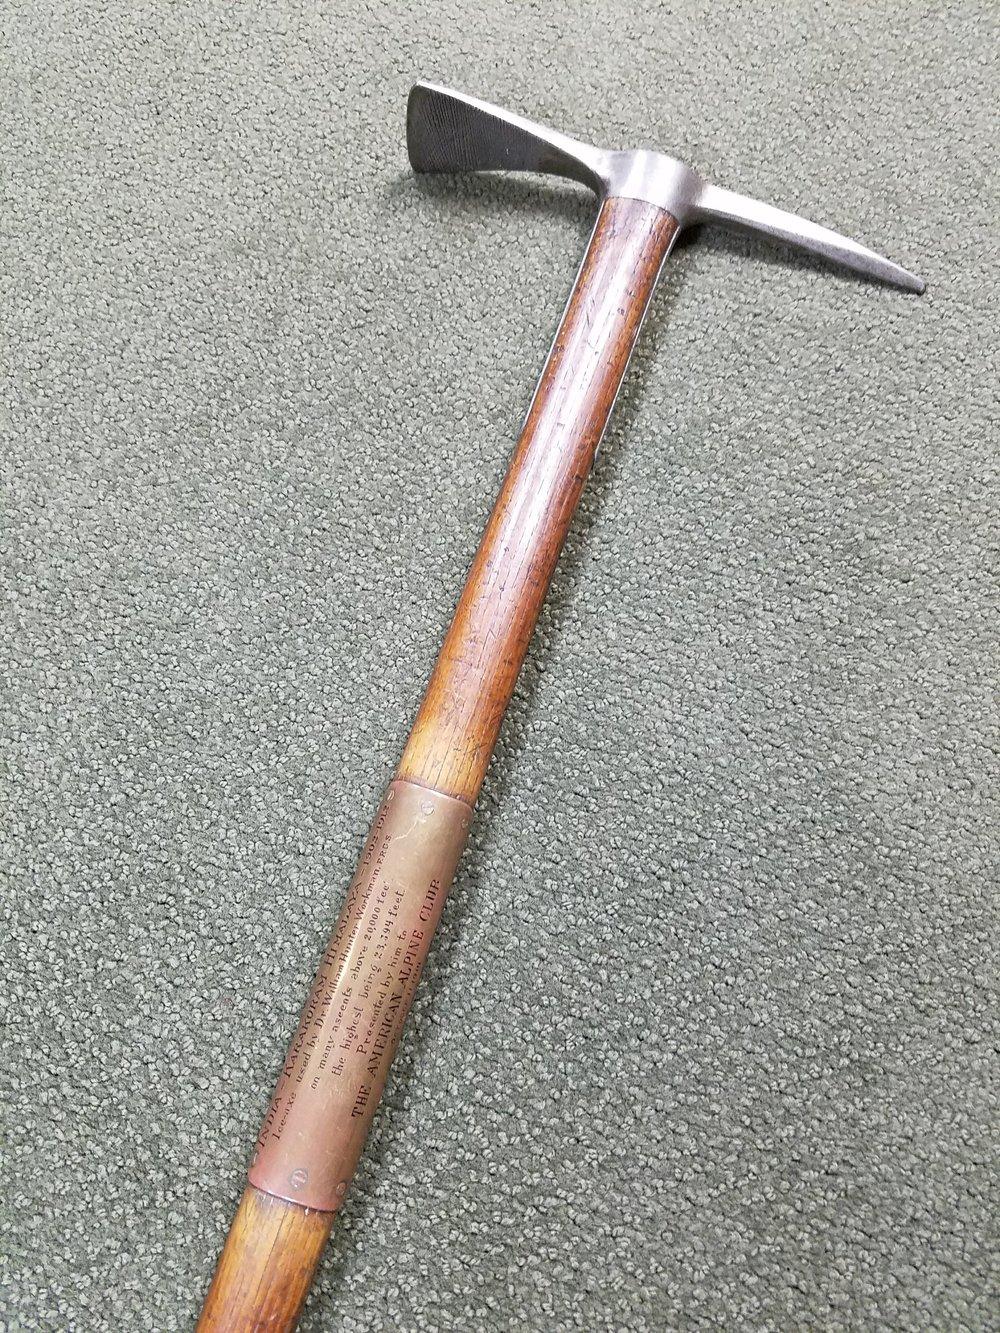 William Hunter Workman's ice axe. Workman was the husband of Fanny Bullock Workman.